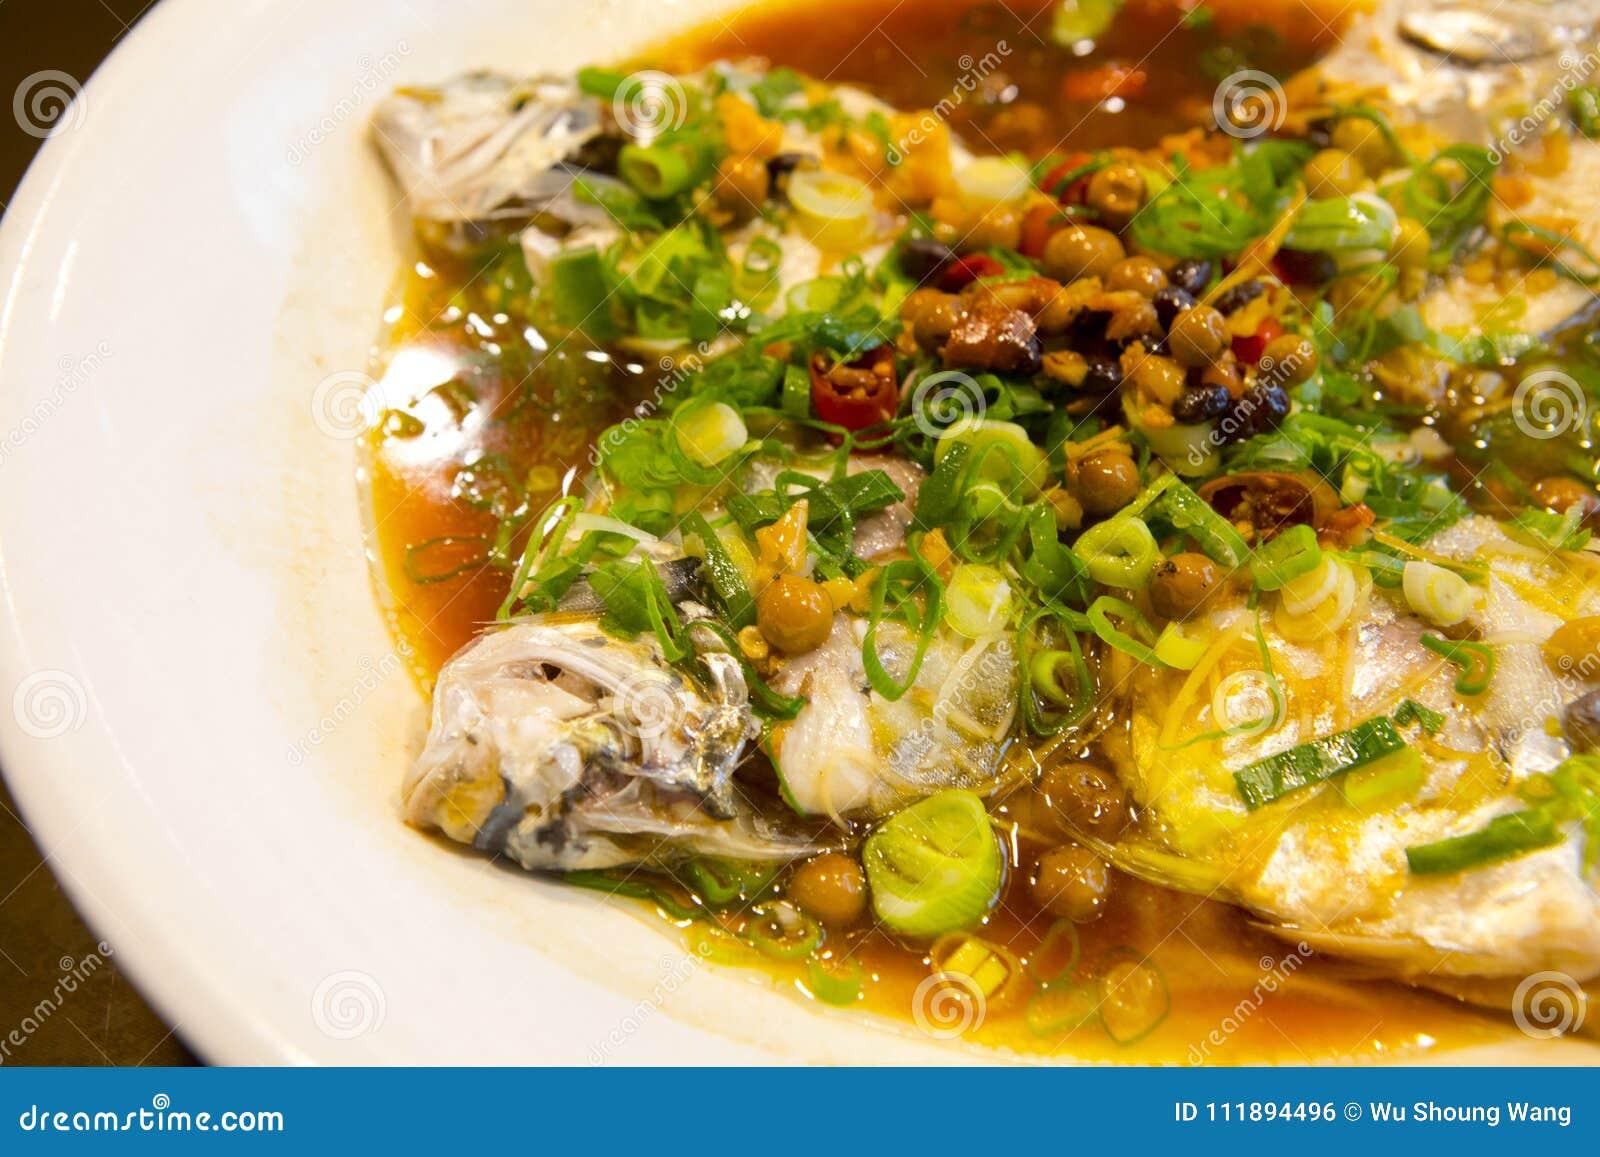 Taipei Taiwan Seafood Restaurants Restaurants Stealing